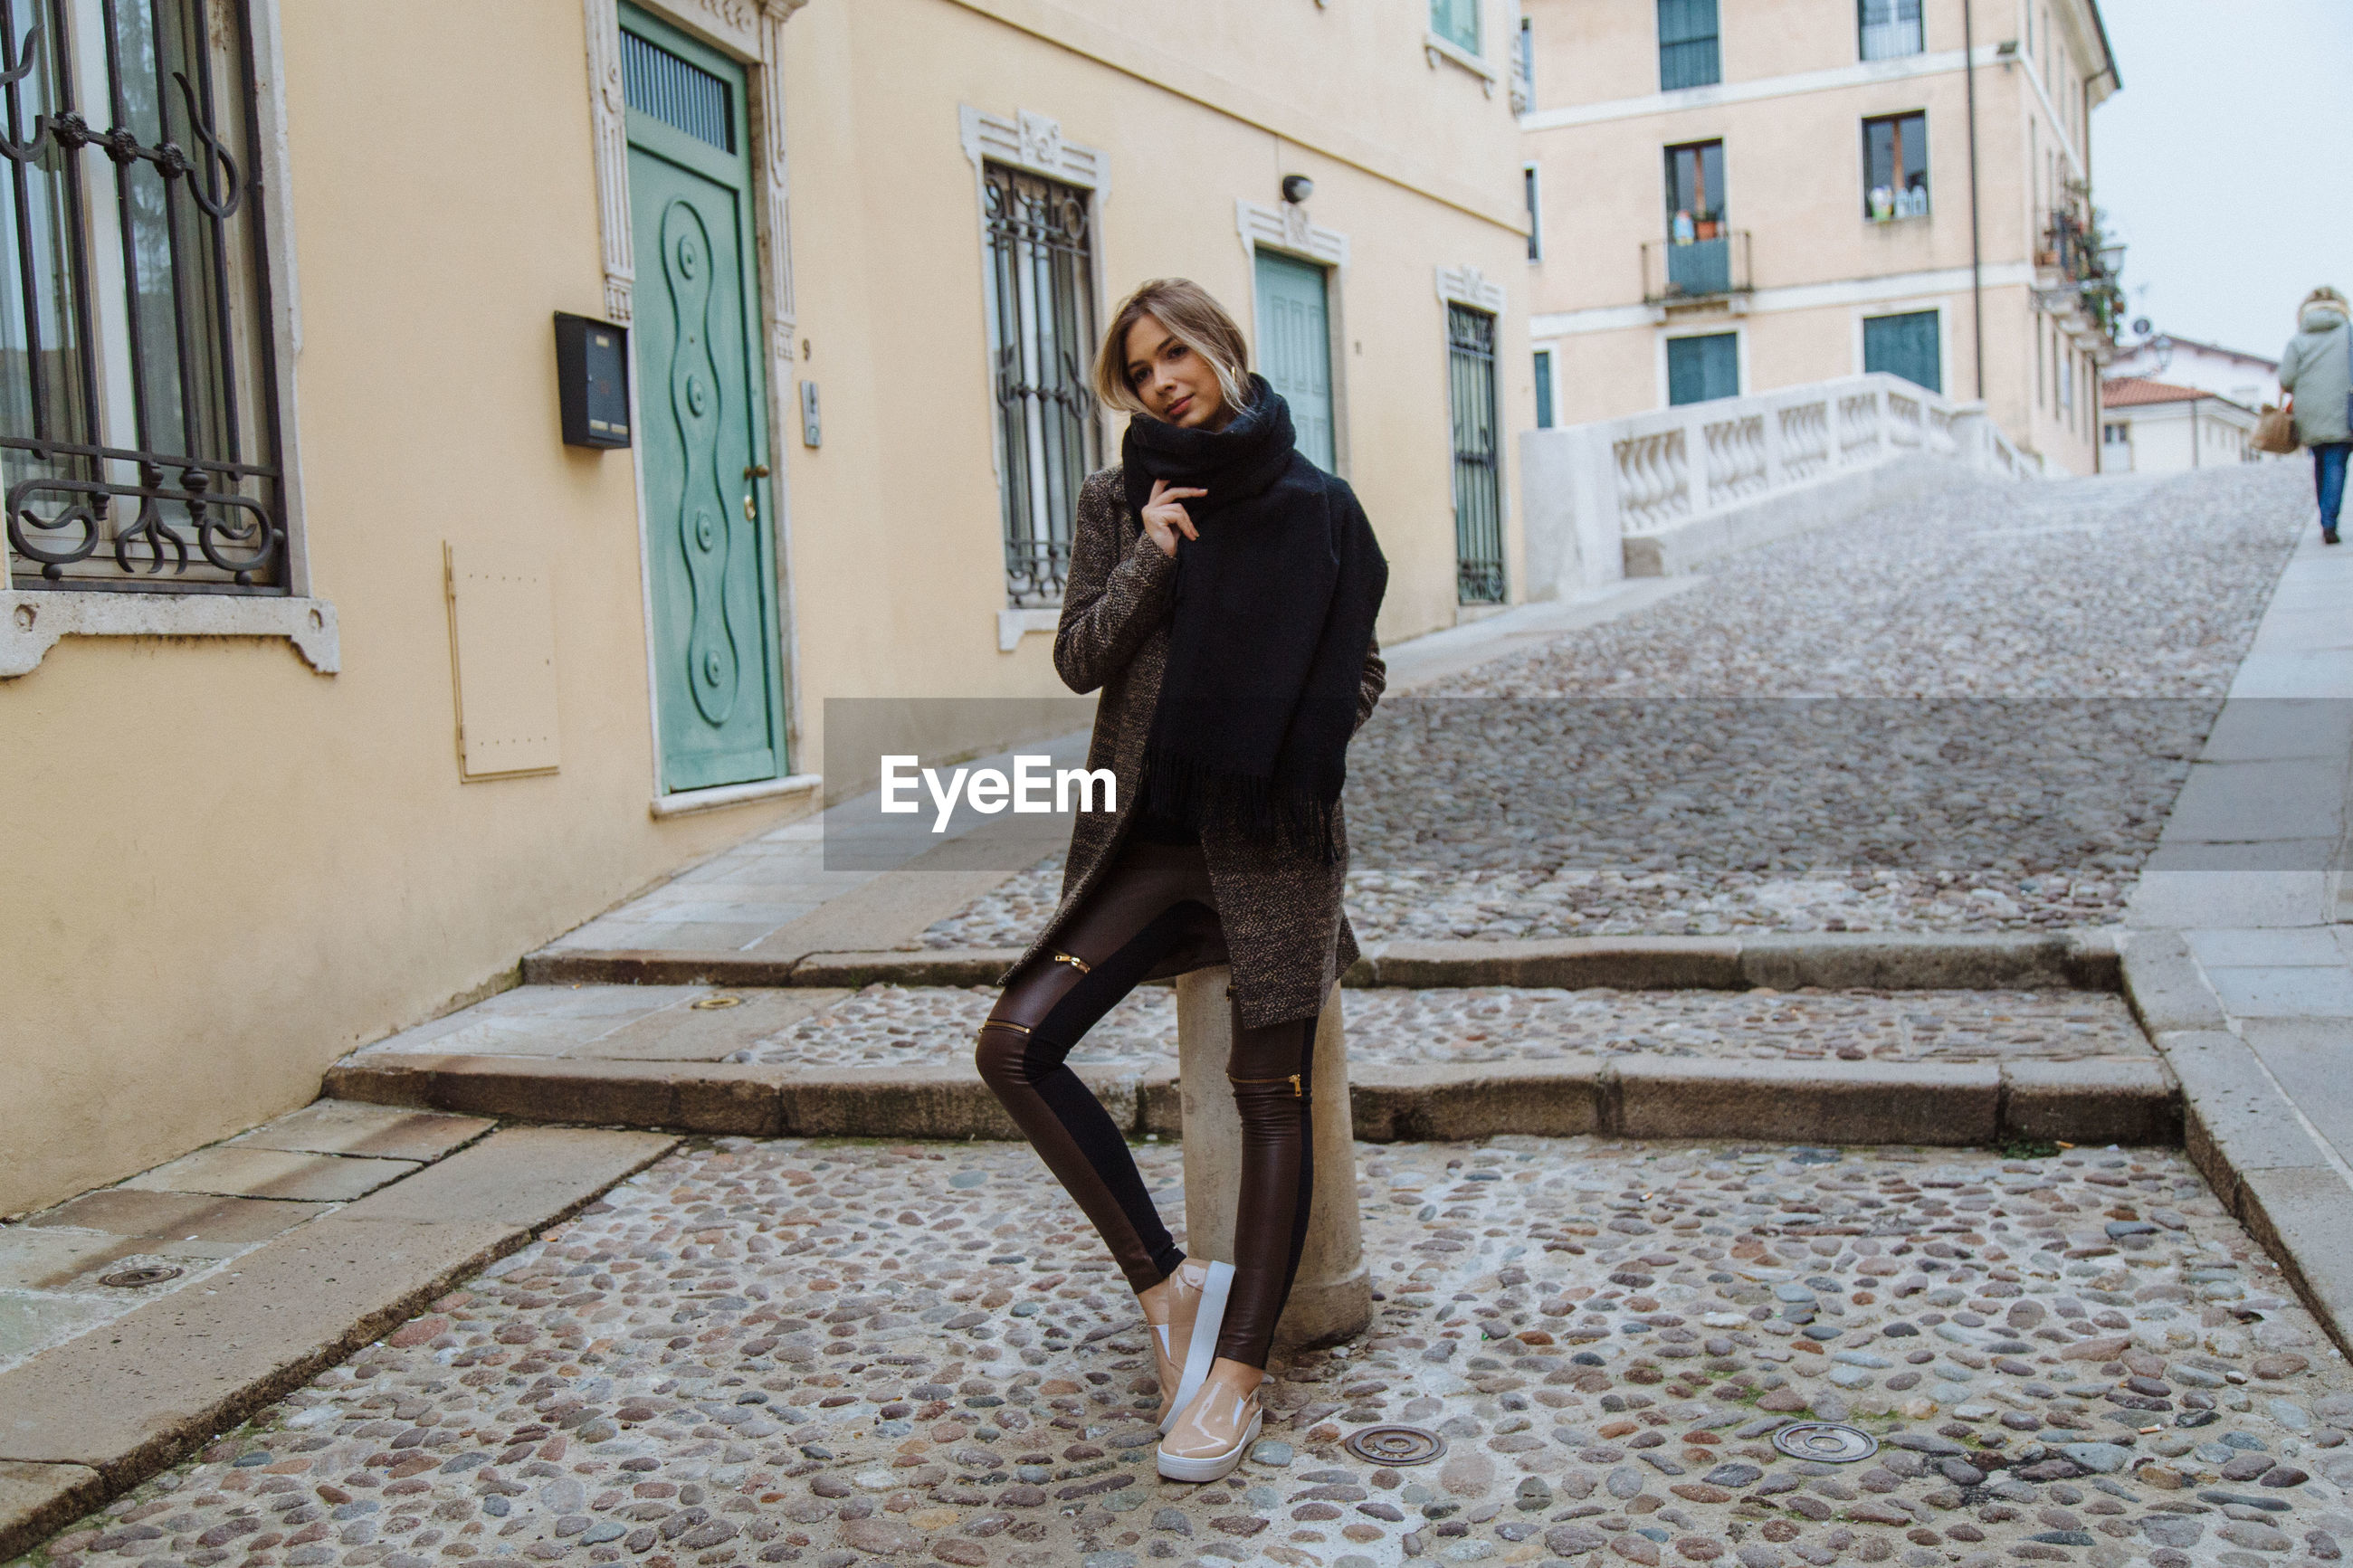 Woman sitting on bollard in city